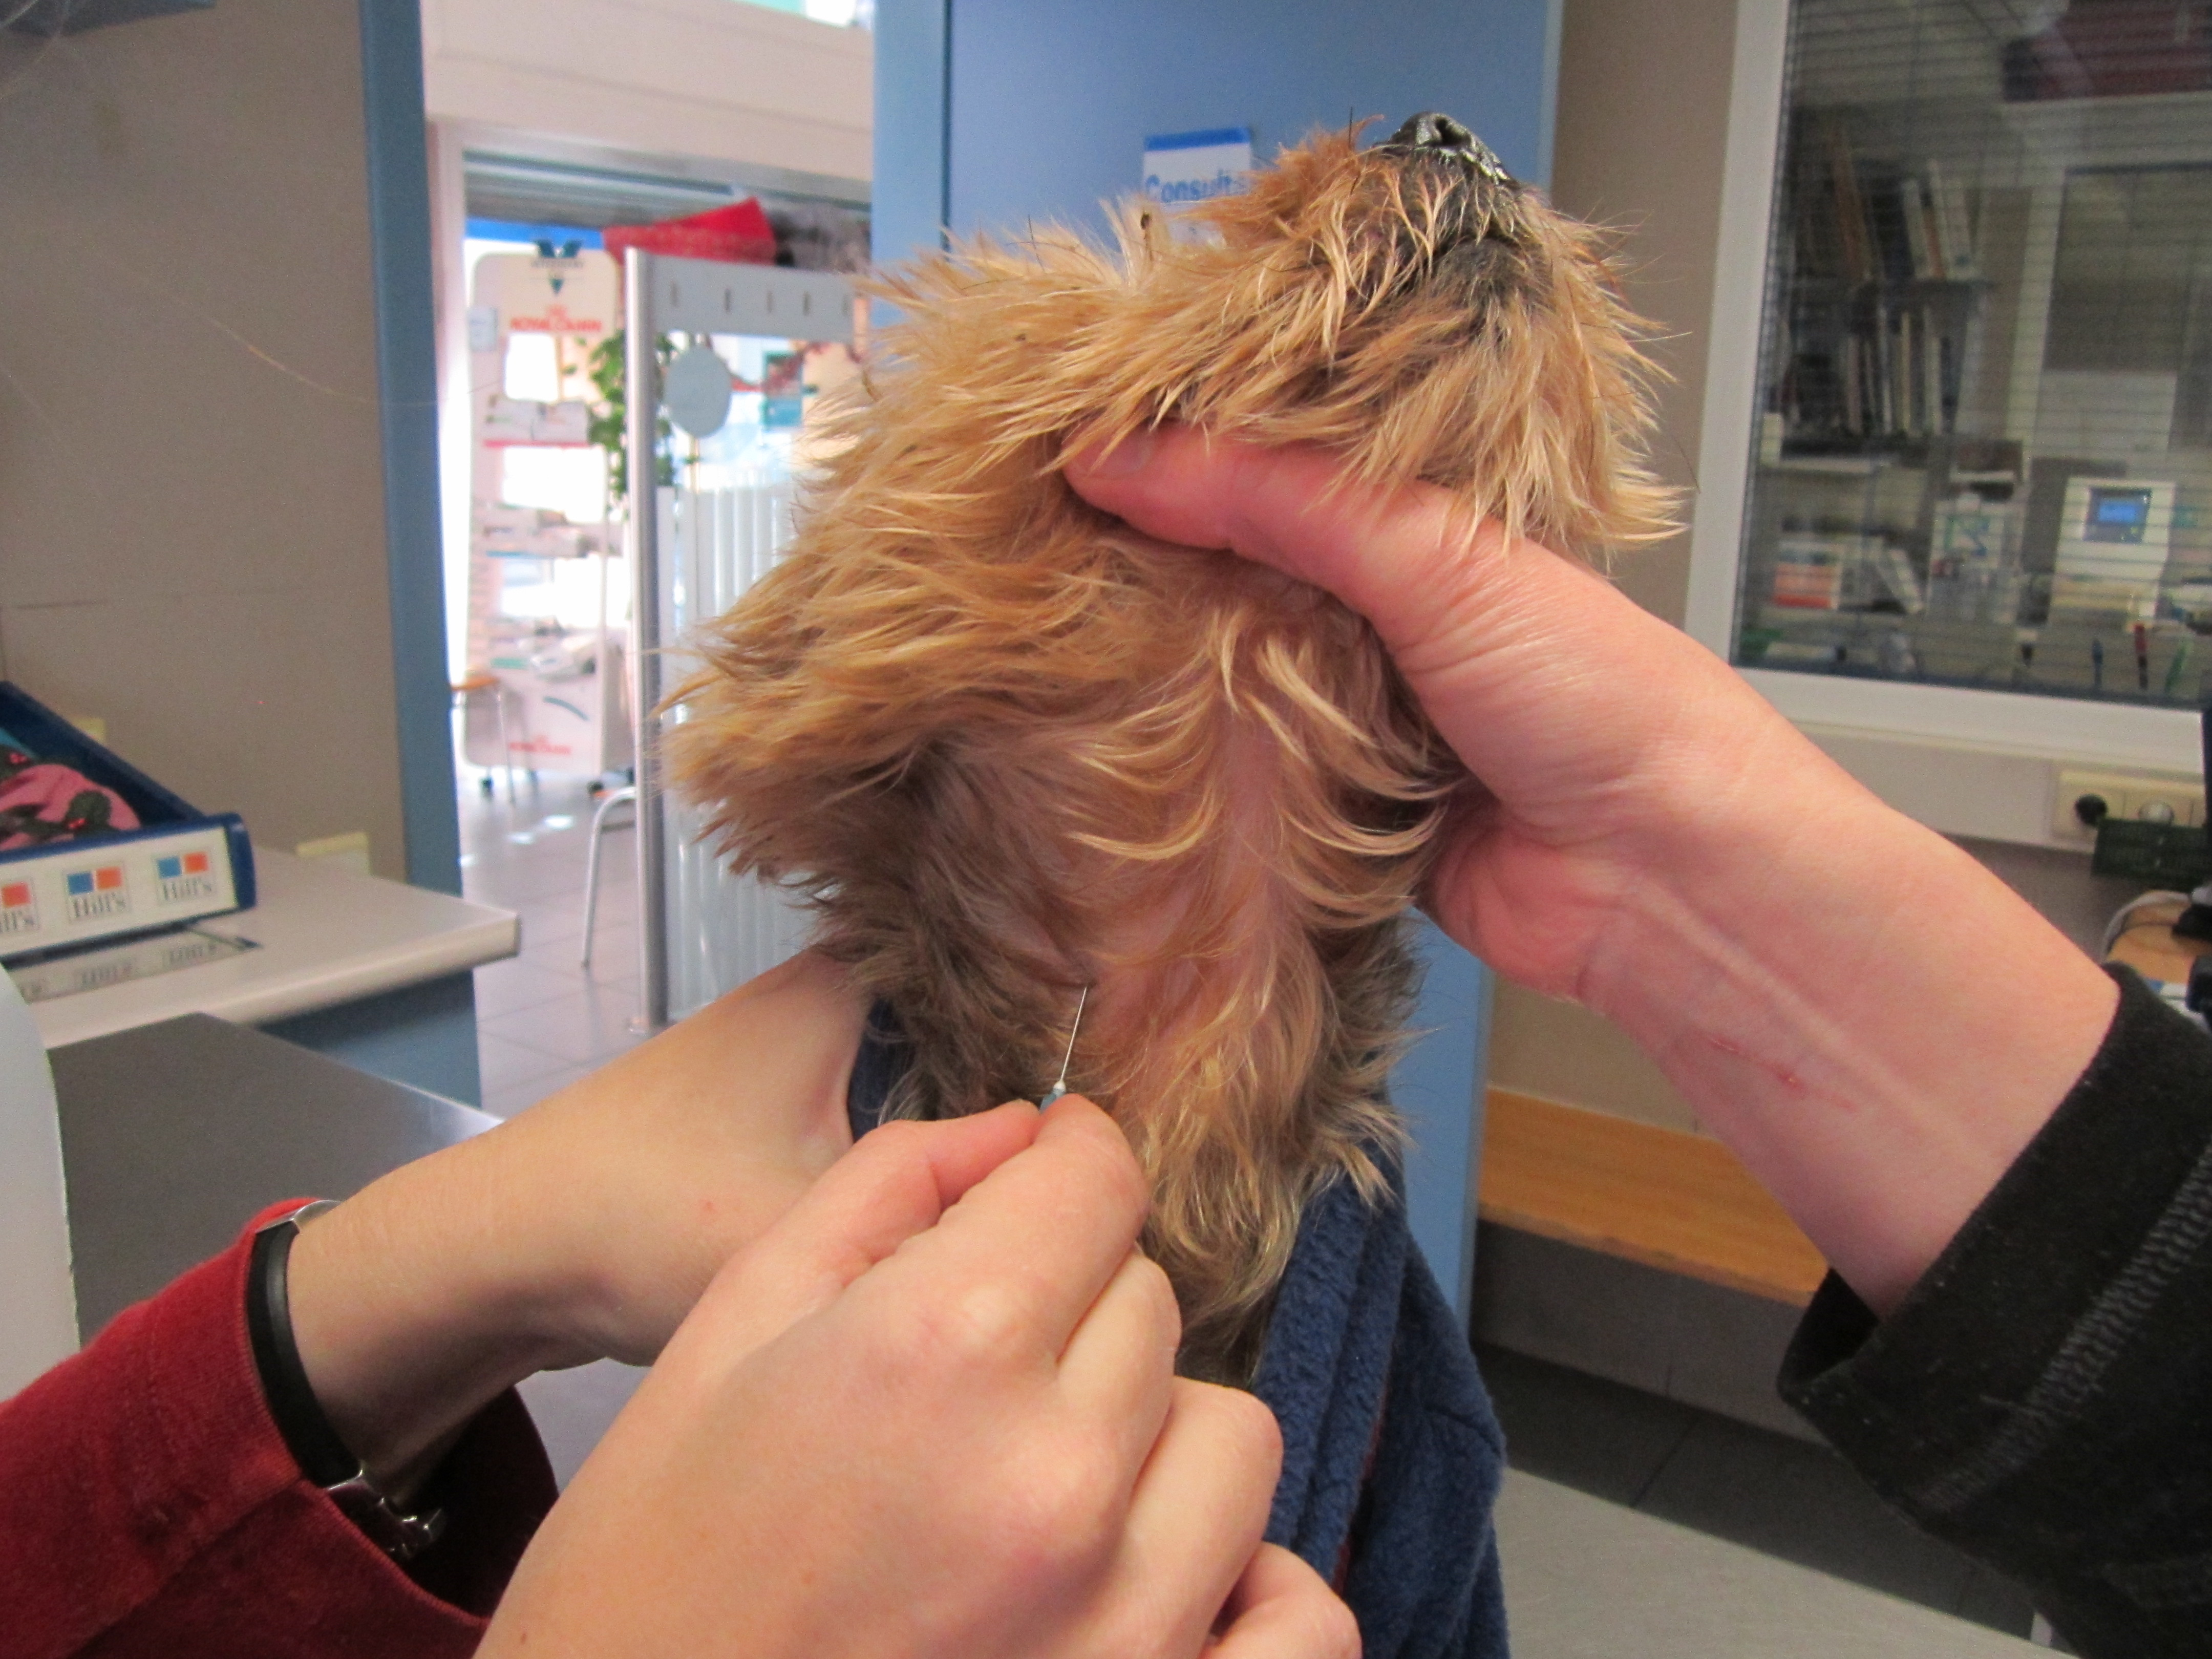 hernia perineal perro   historiasveterinarias/vetstories